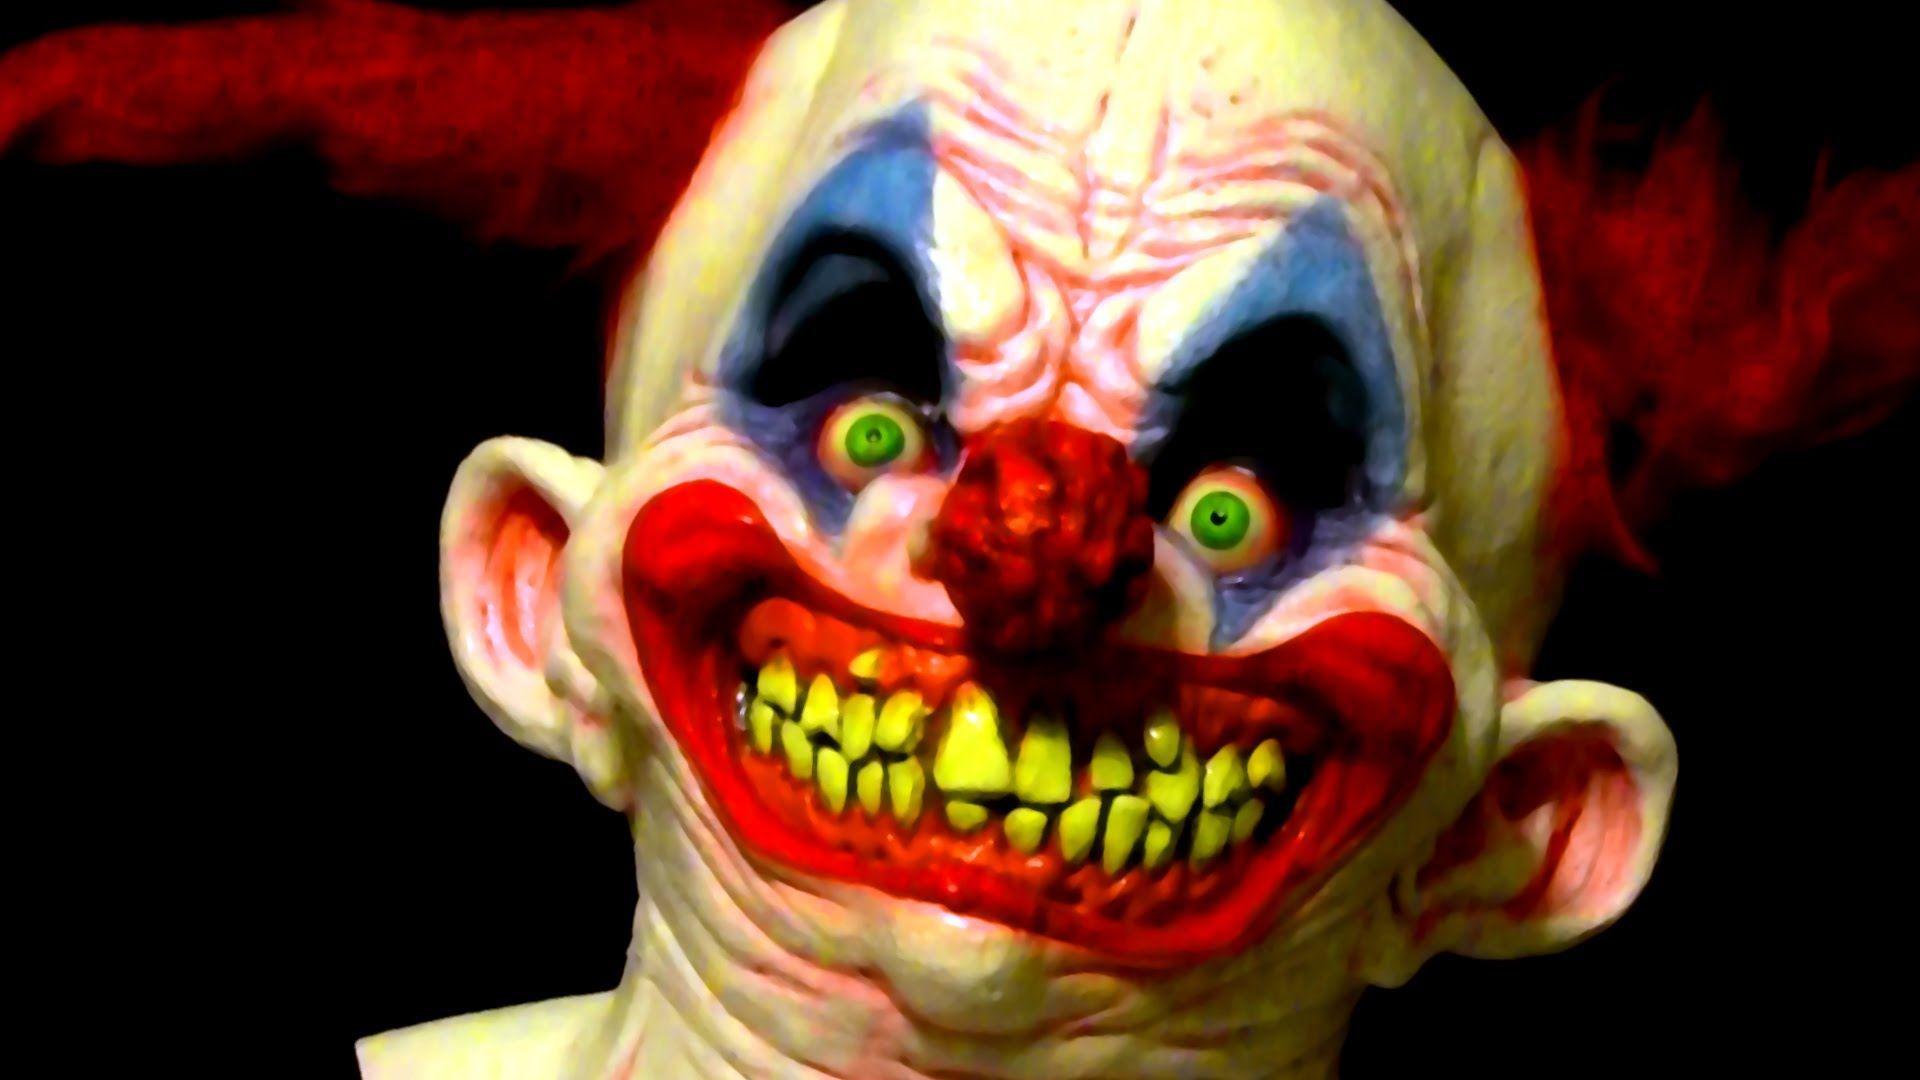 Killer Clown Wallpapers Group 1920x1080 36